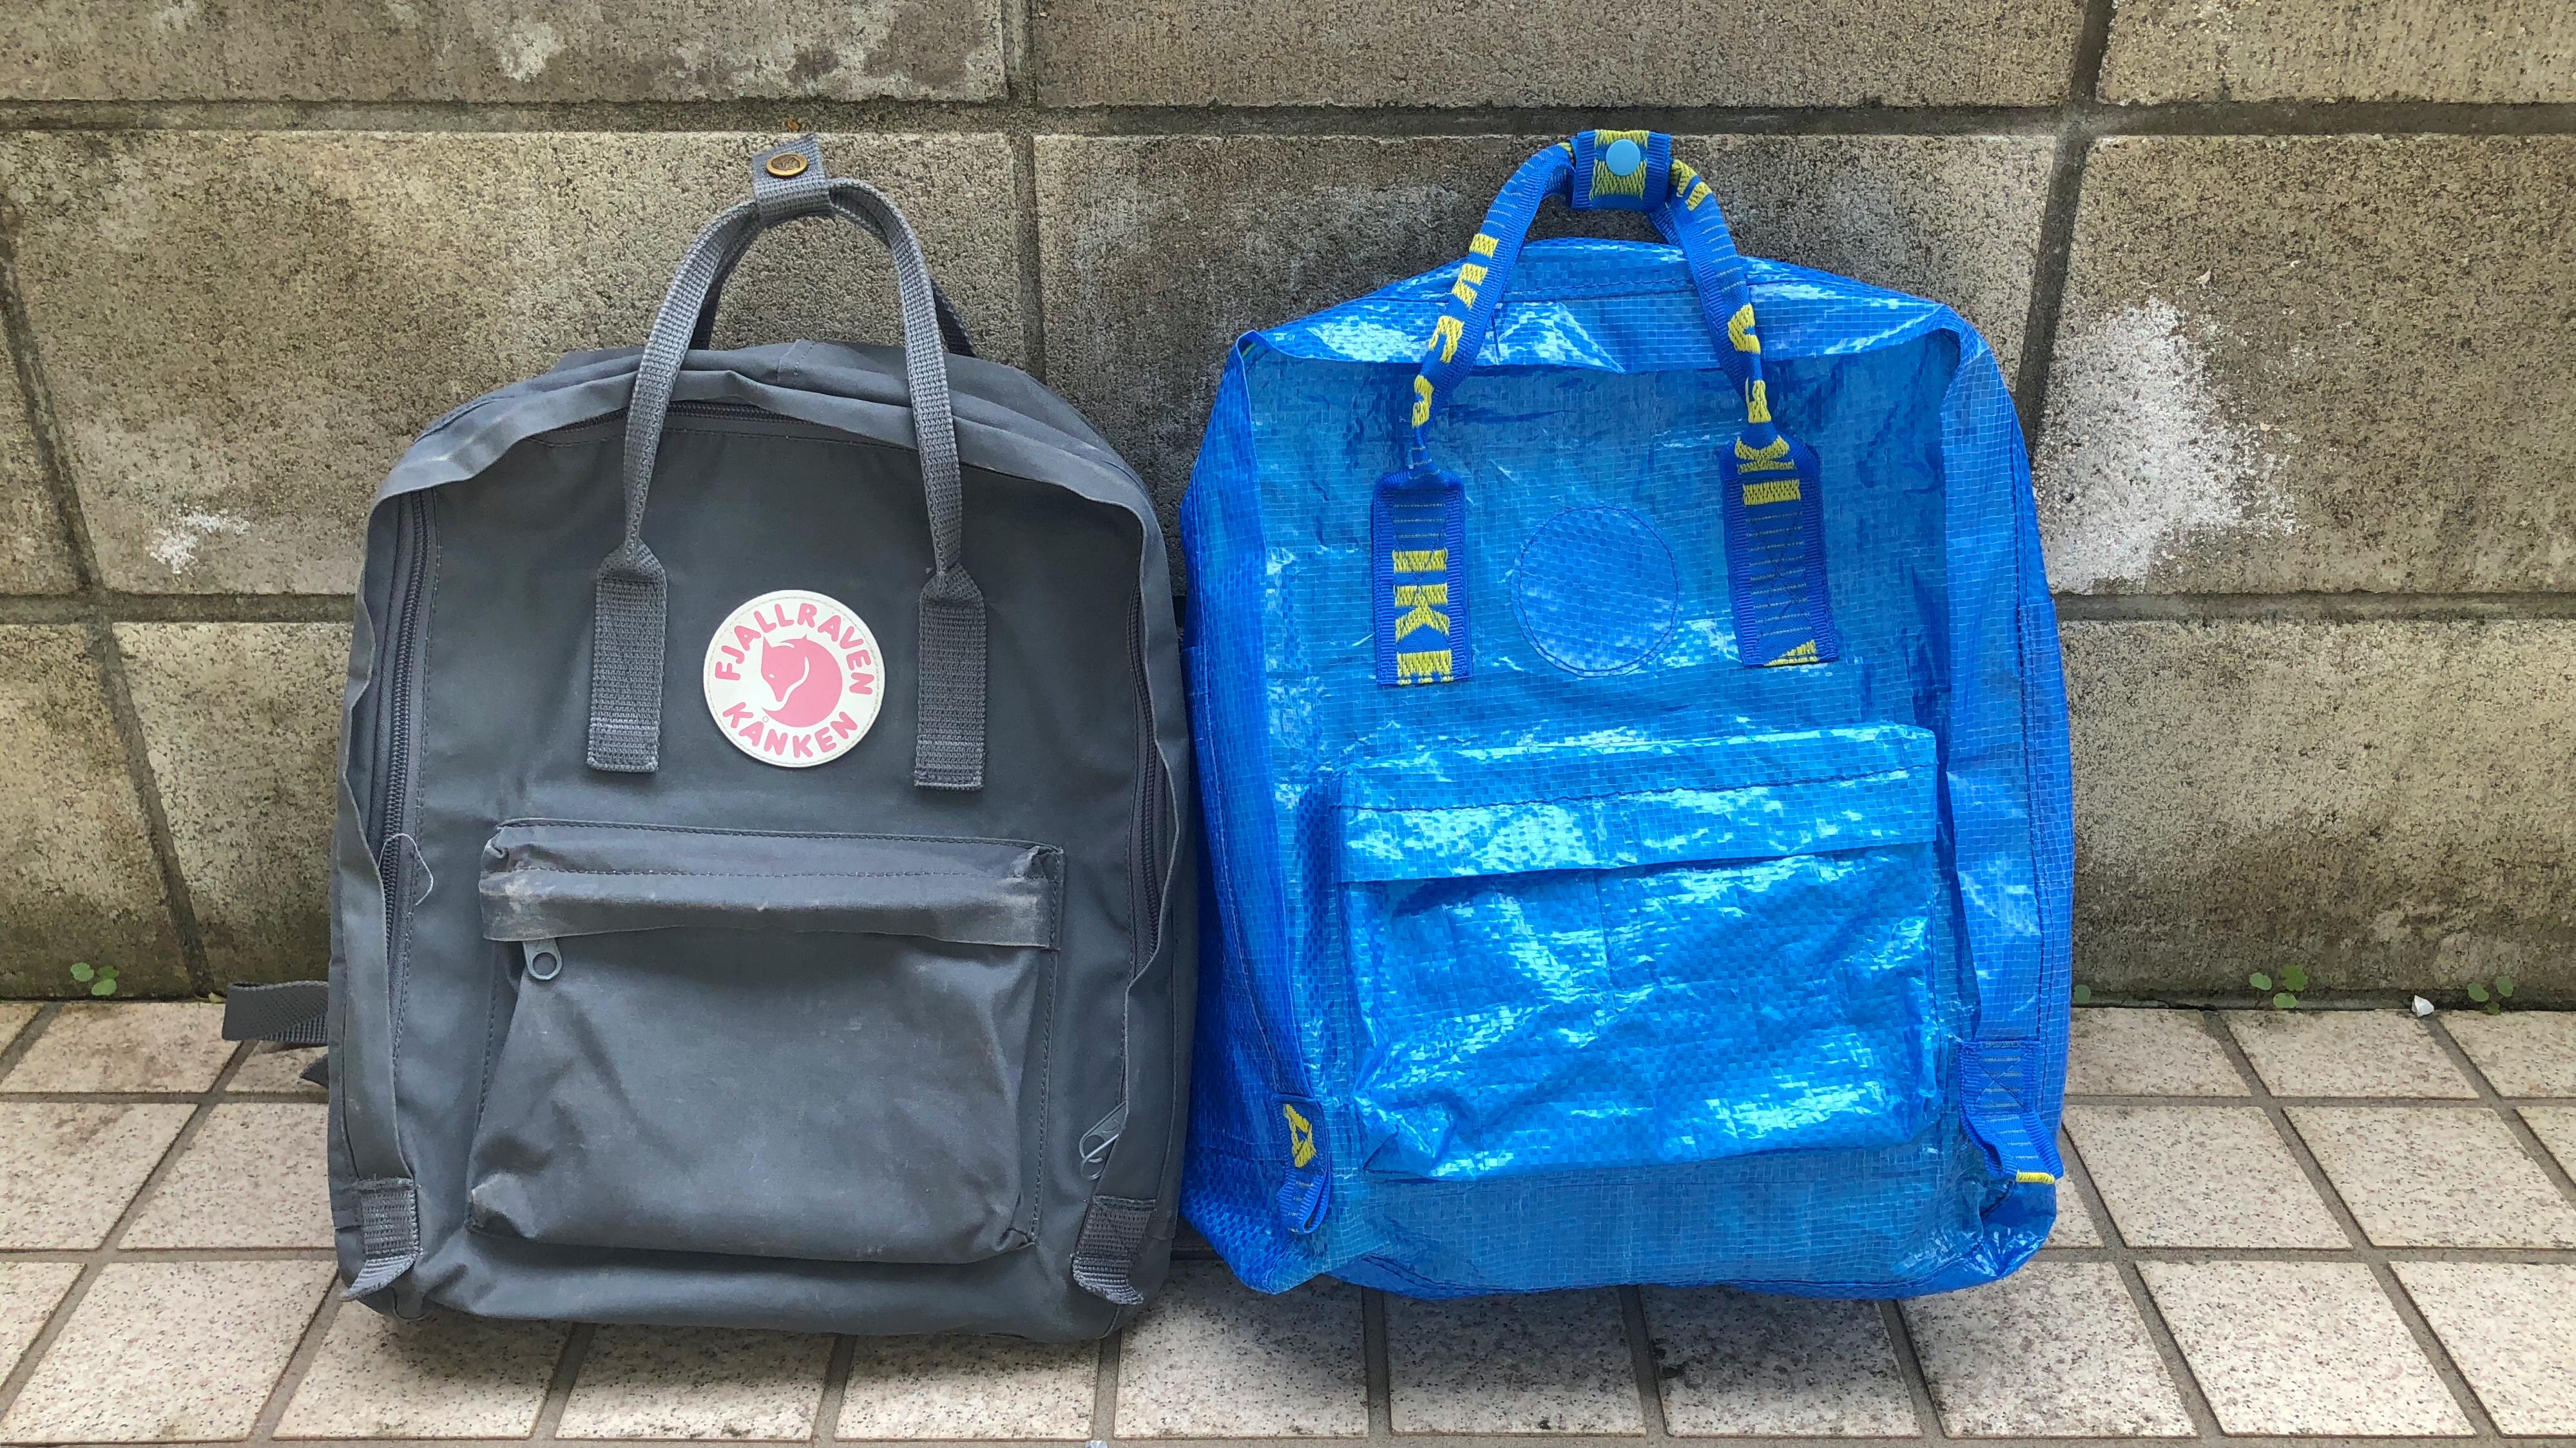 be372d4c02 IKEA backpack (Kanken backpack knockoff) – verypurpleperson